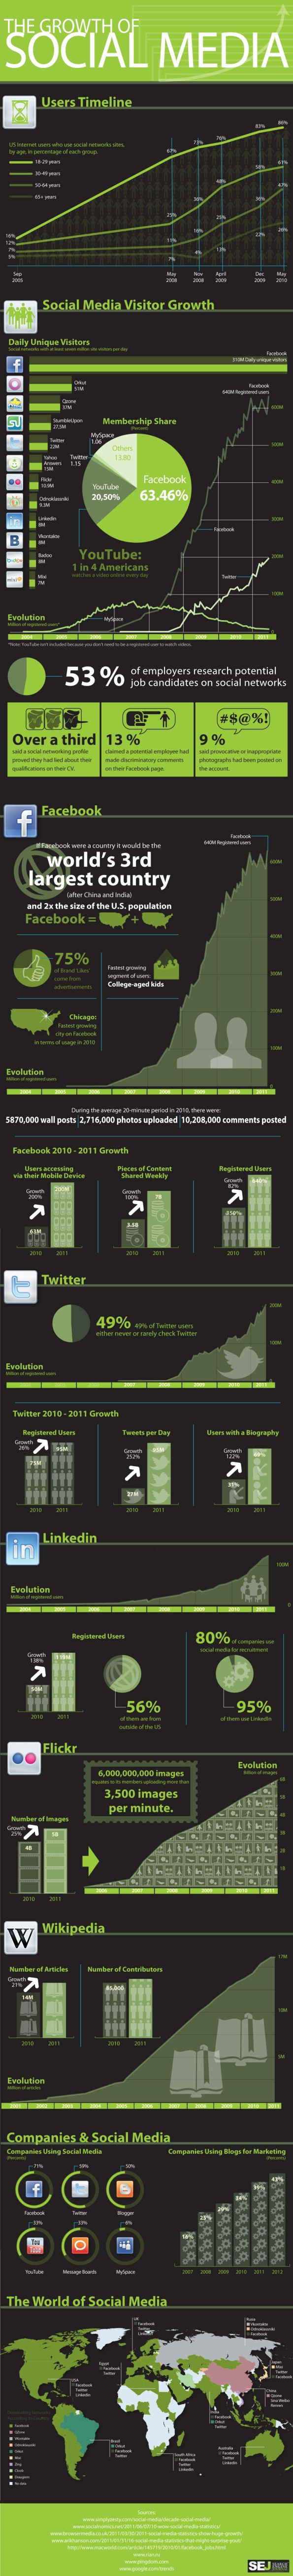 El crecimiento del social media Infografia